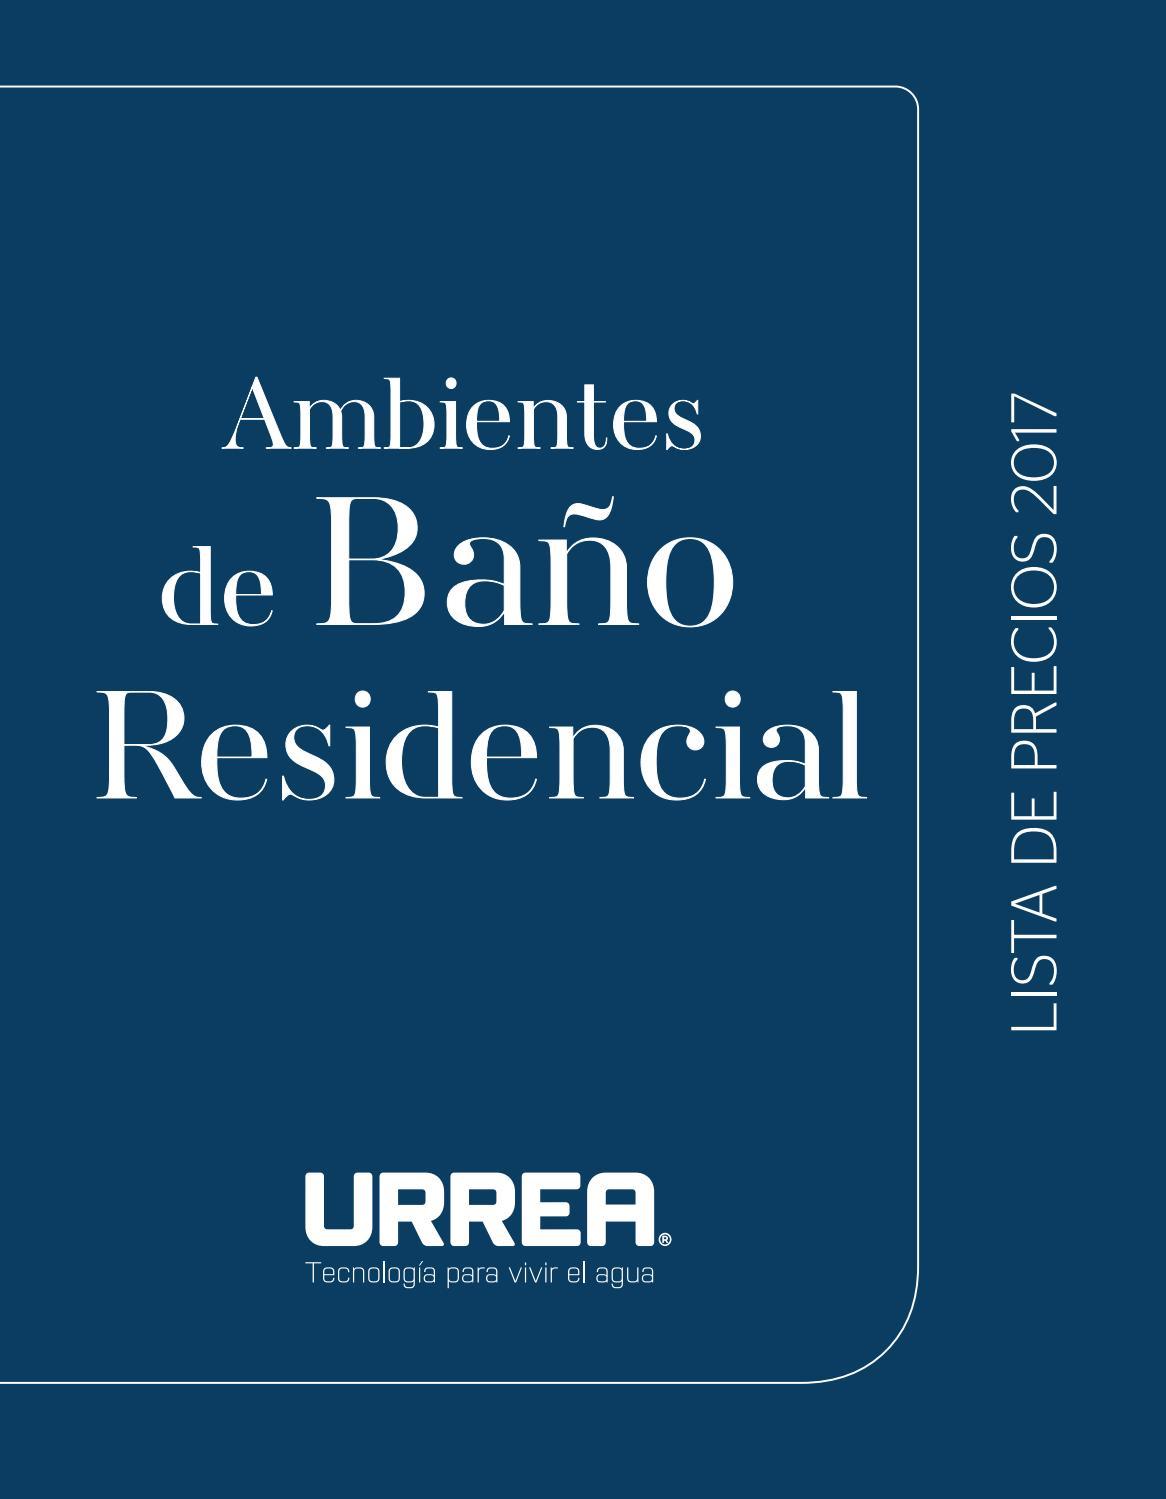 Lista de precios urrea 2017 by urrea m xico issuu for Muebles para bano urrea